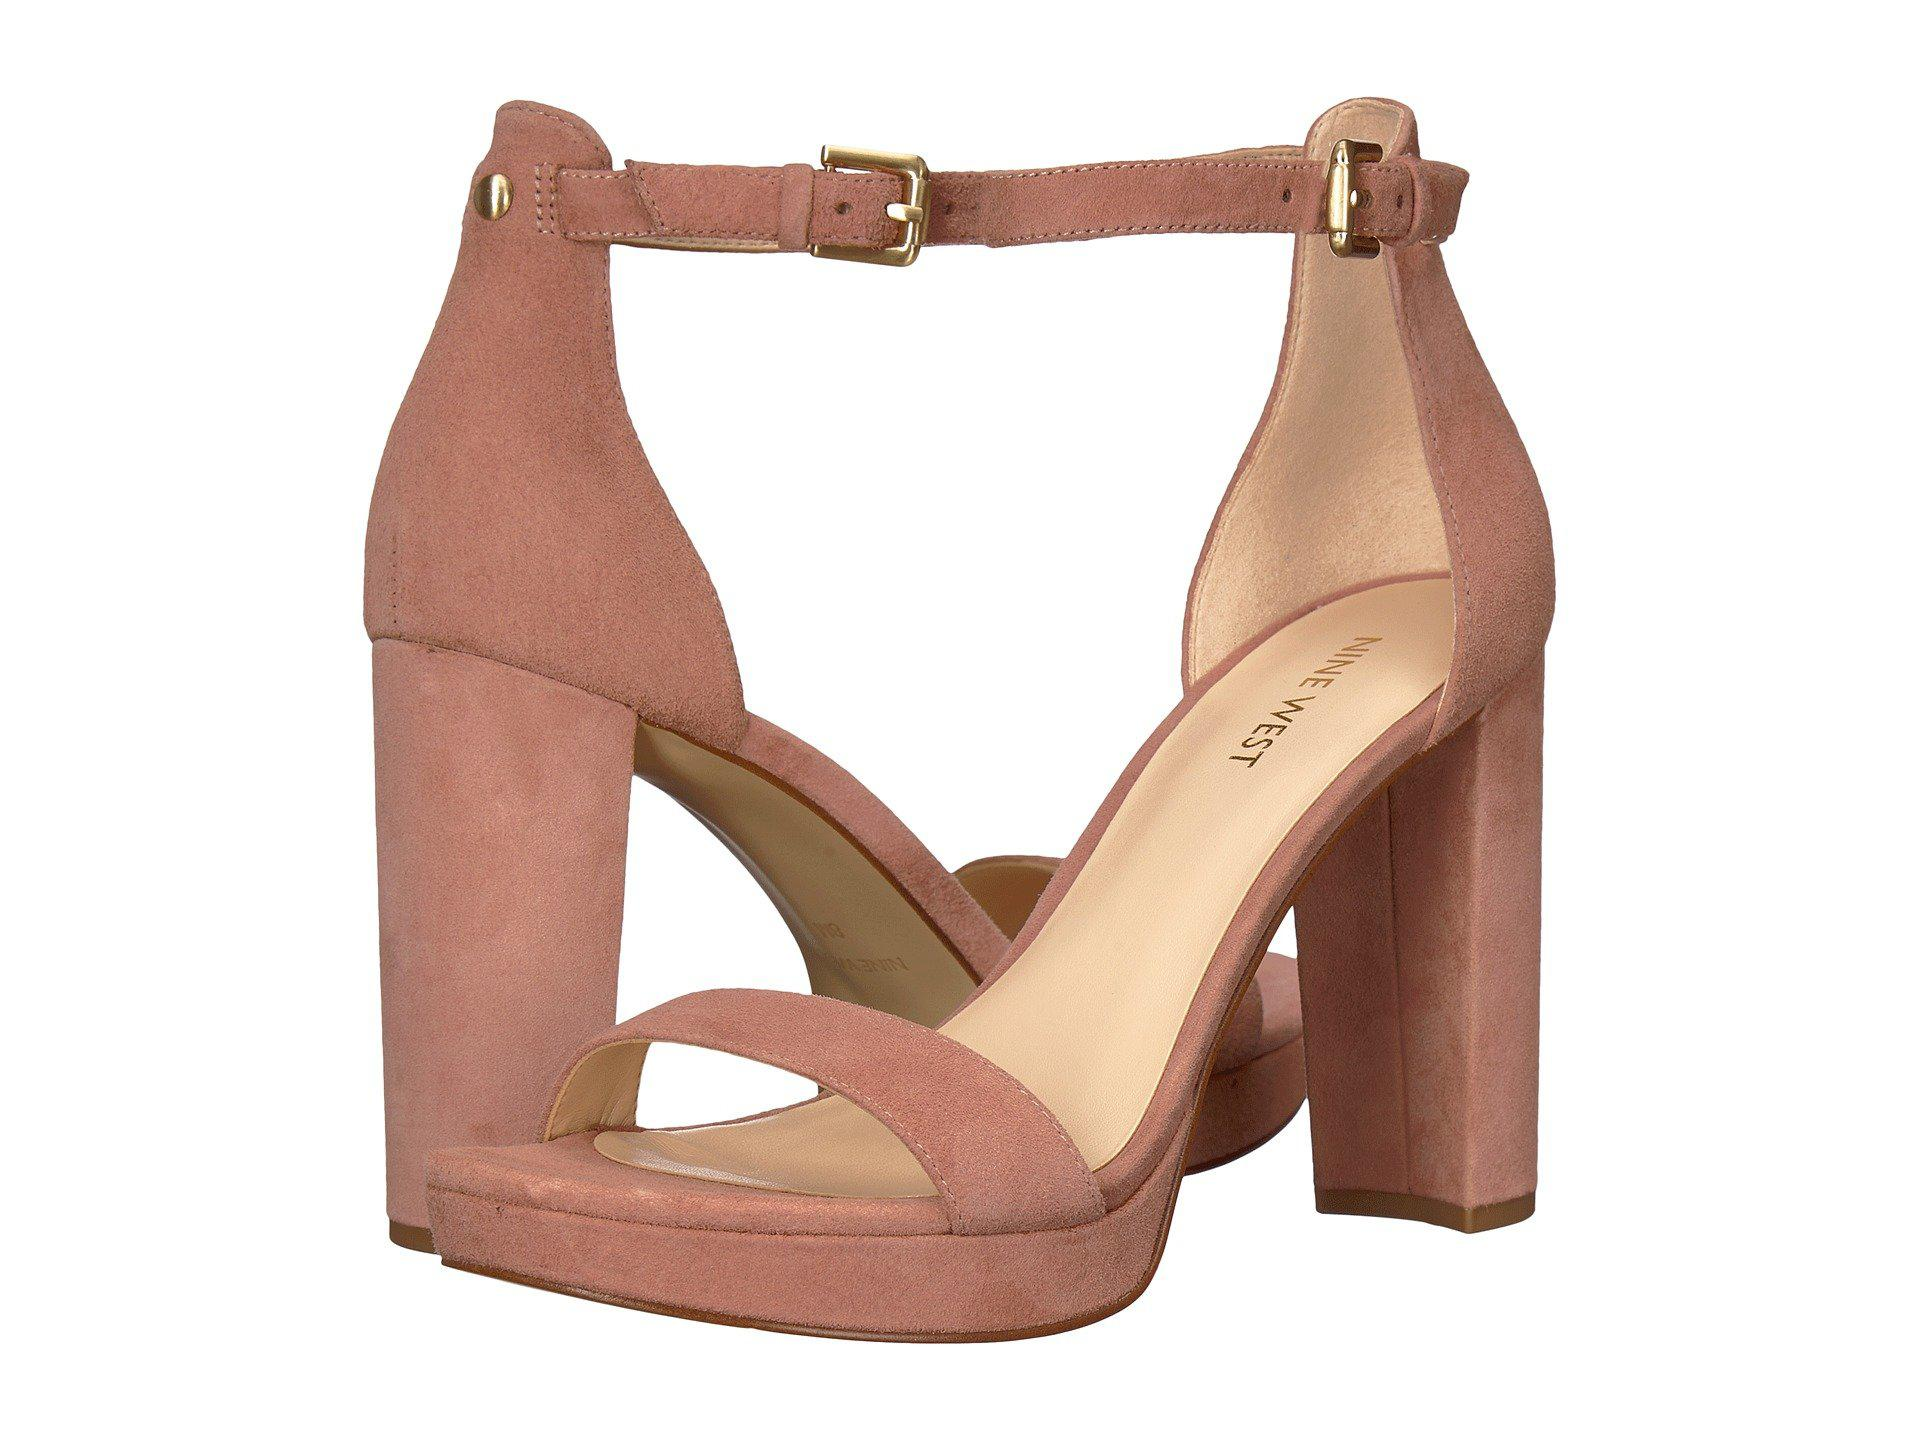 cce97b9a945c Lyst - Nine West Dempsey Platform Heel Sandal - Save 34%